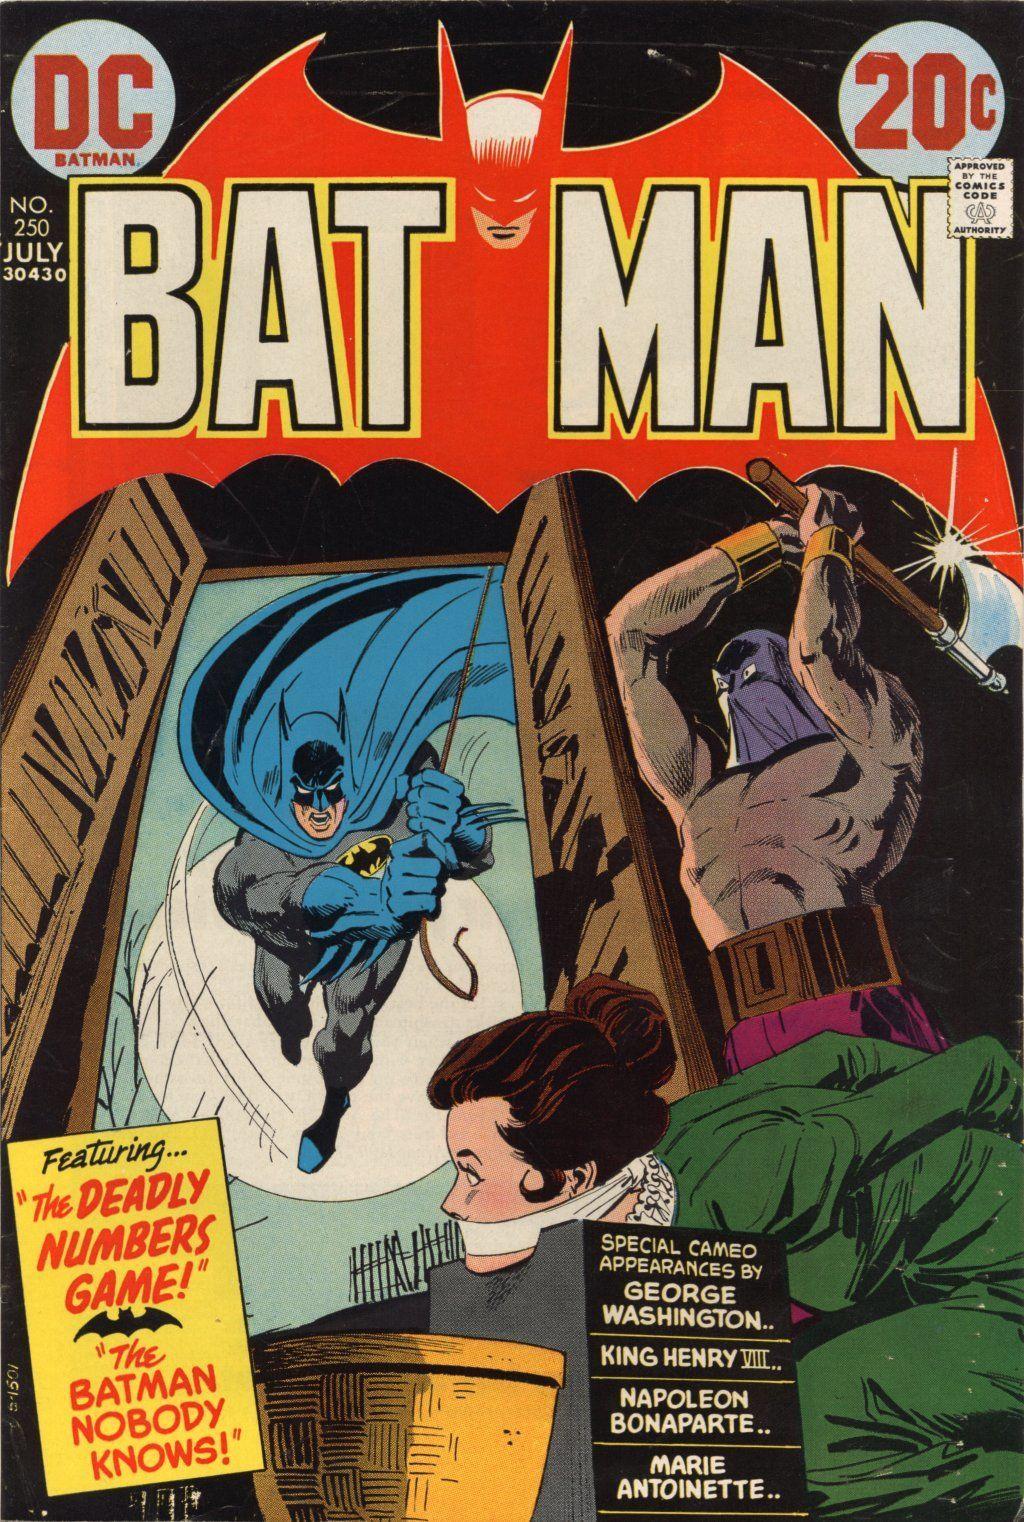 Batman #250 (Writer: Frank Robbins Artist: Dick Giordano)